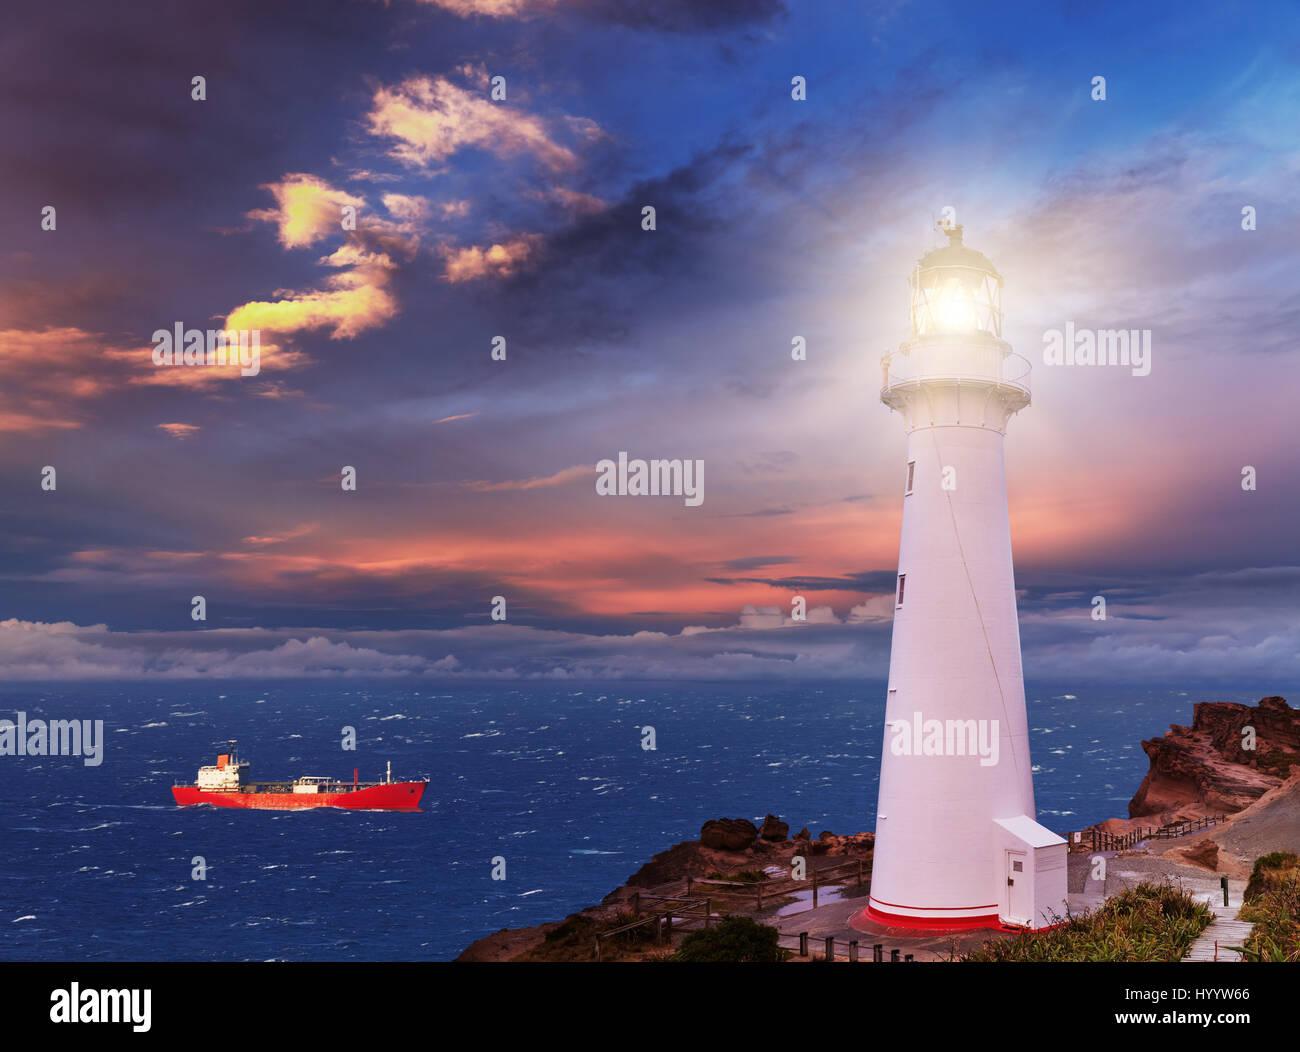 Sonnenuntergang Seascape, Leuchtturm auf der Klippe Stockbild